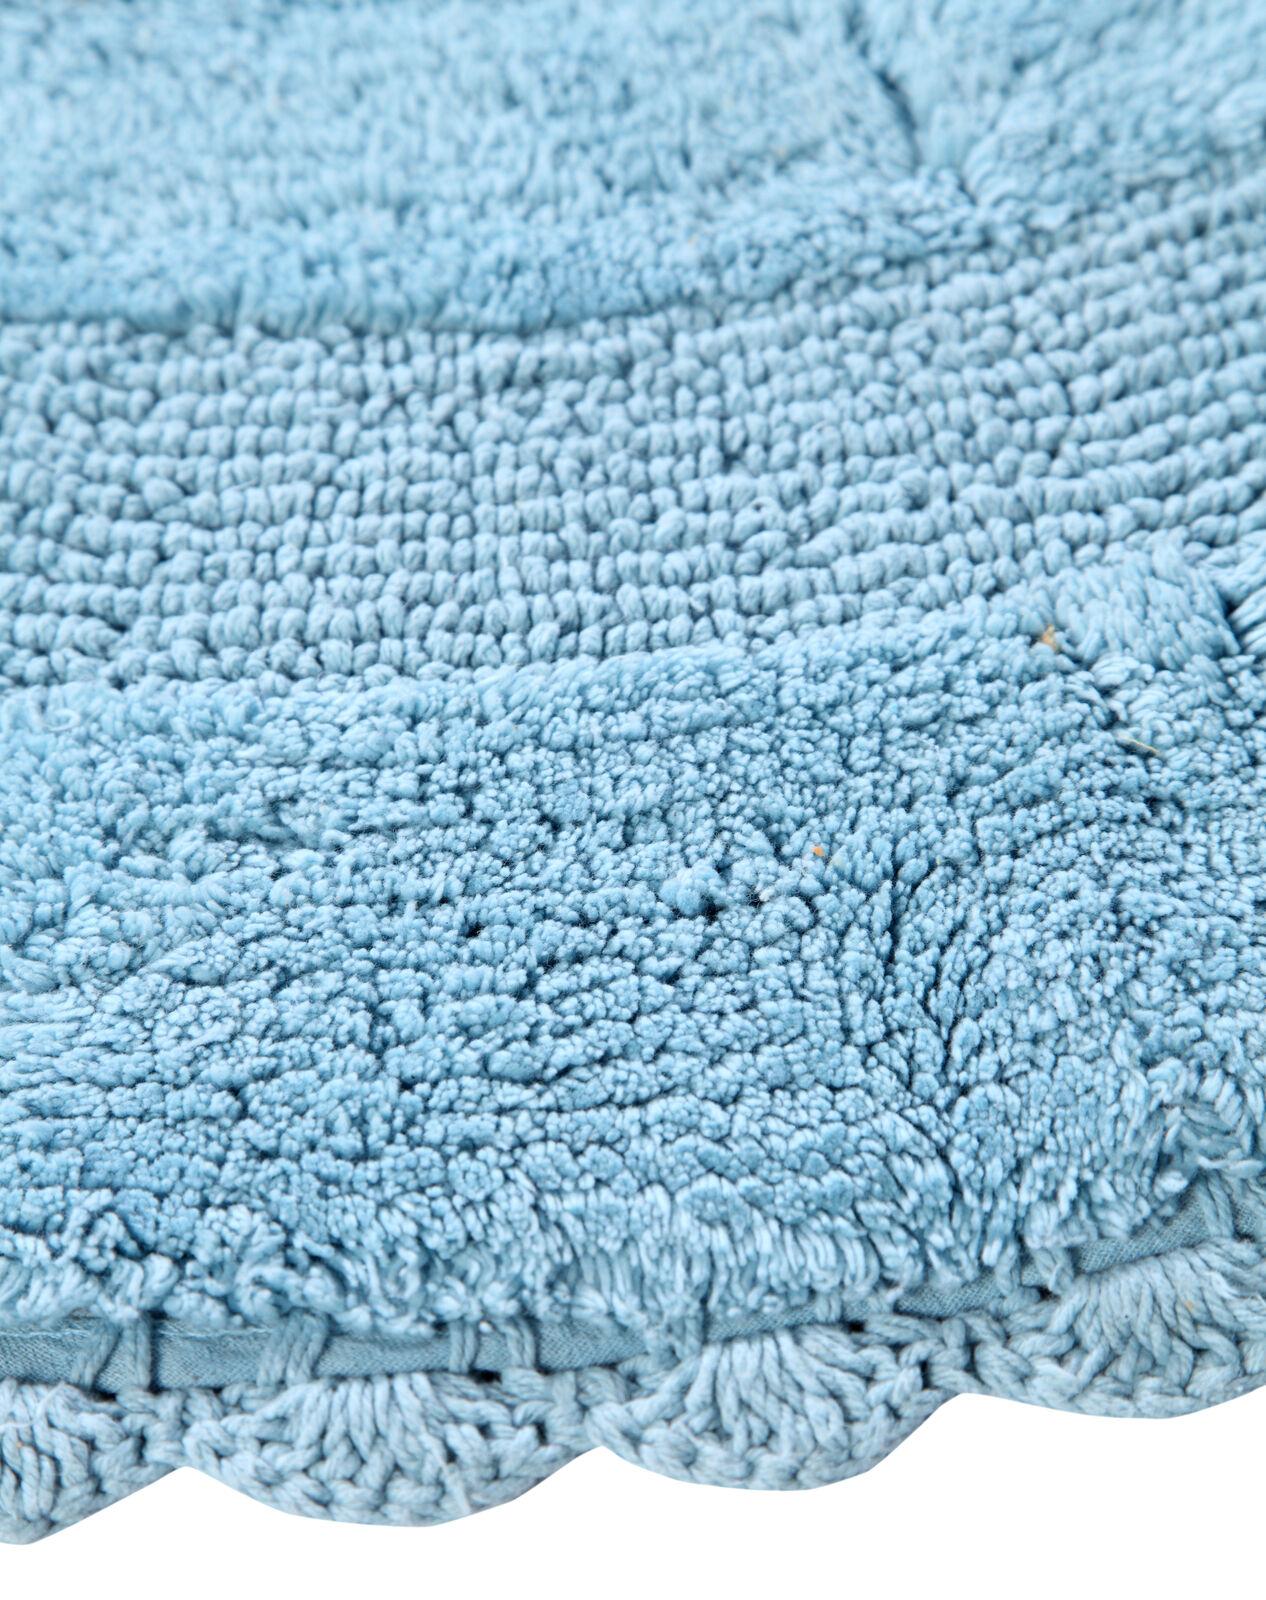 Bath Rug Cotton 36 Inch Round, Reversible, Arctic Blau, Crochet Lace Border